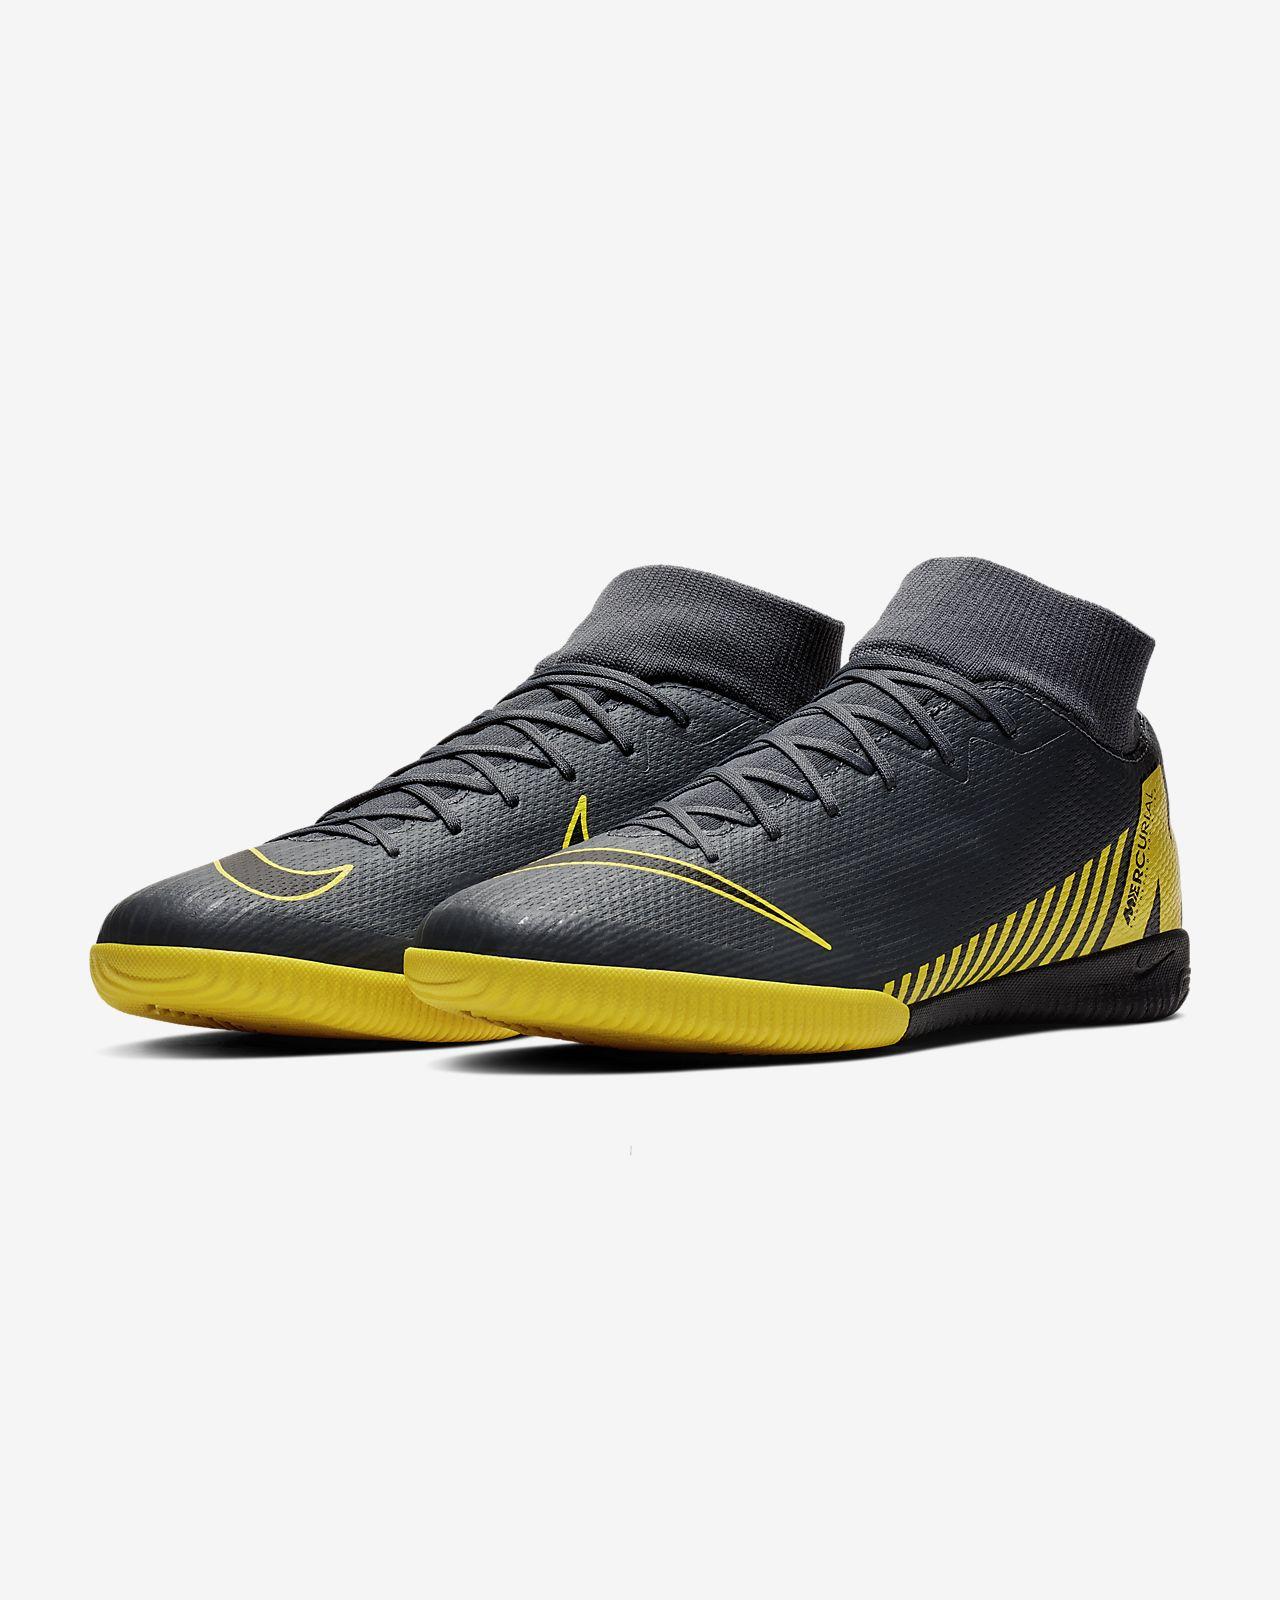 098f5ce0353b Nike SuperflyX 6 Academy IC Indoor Court Football Boot. Nike.com ZA